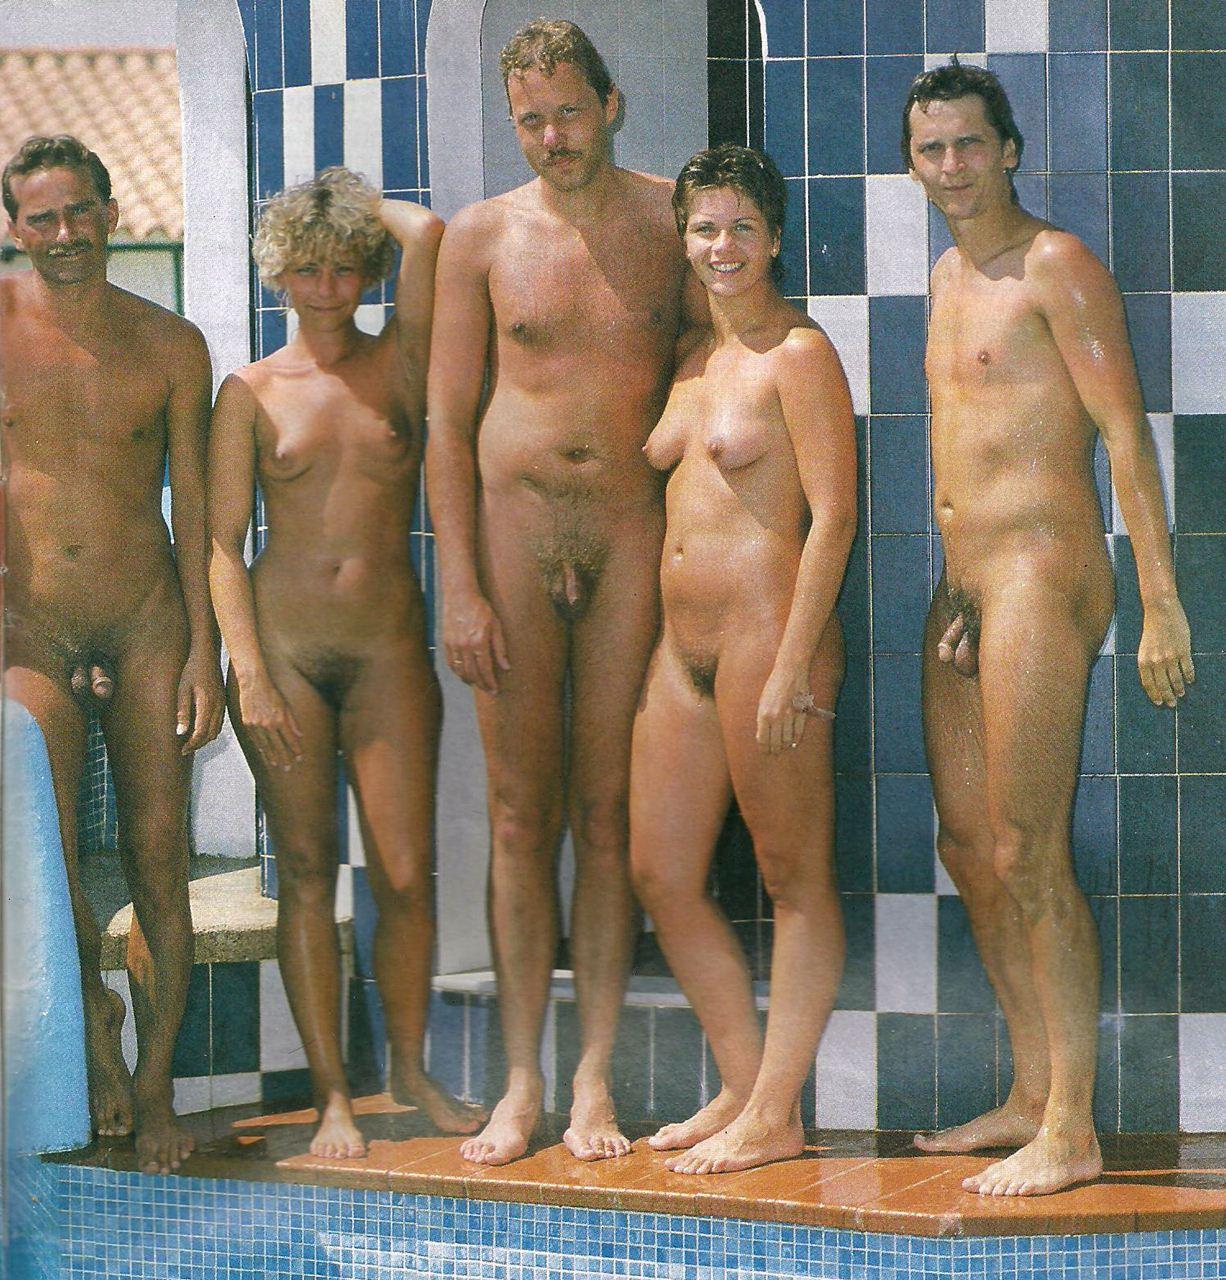 https://www.nudismlife.com/galleries/nudists_and_nude/the_most_natural_nudists/the_most_natural_nudists_0137.jpg